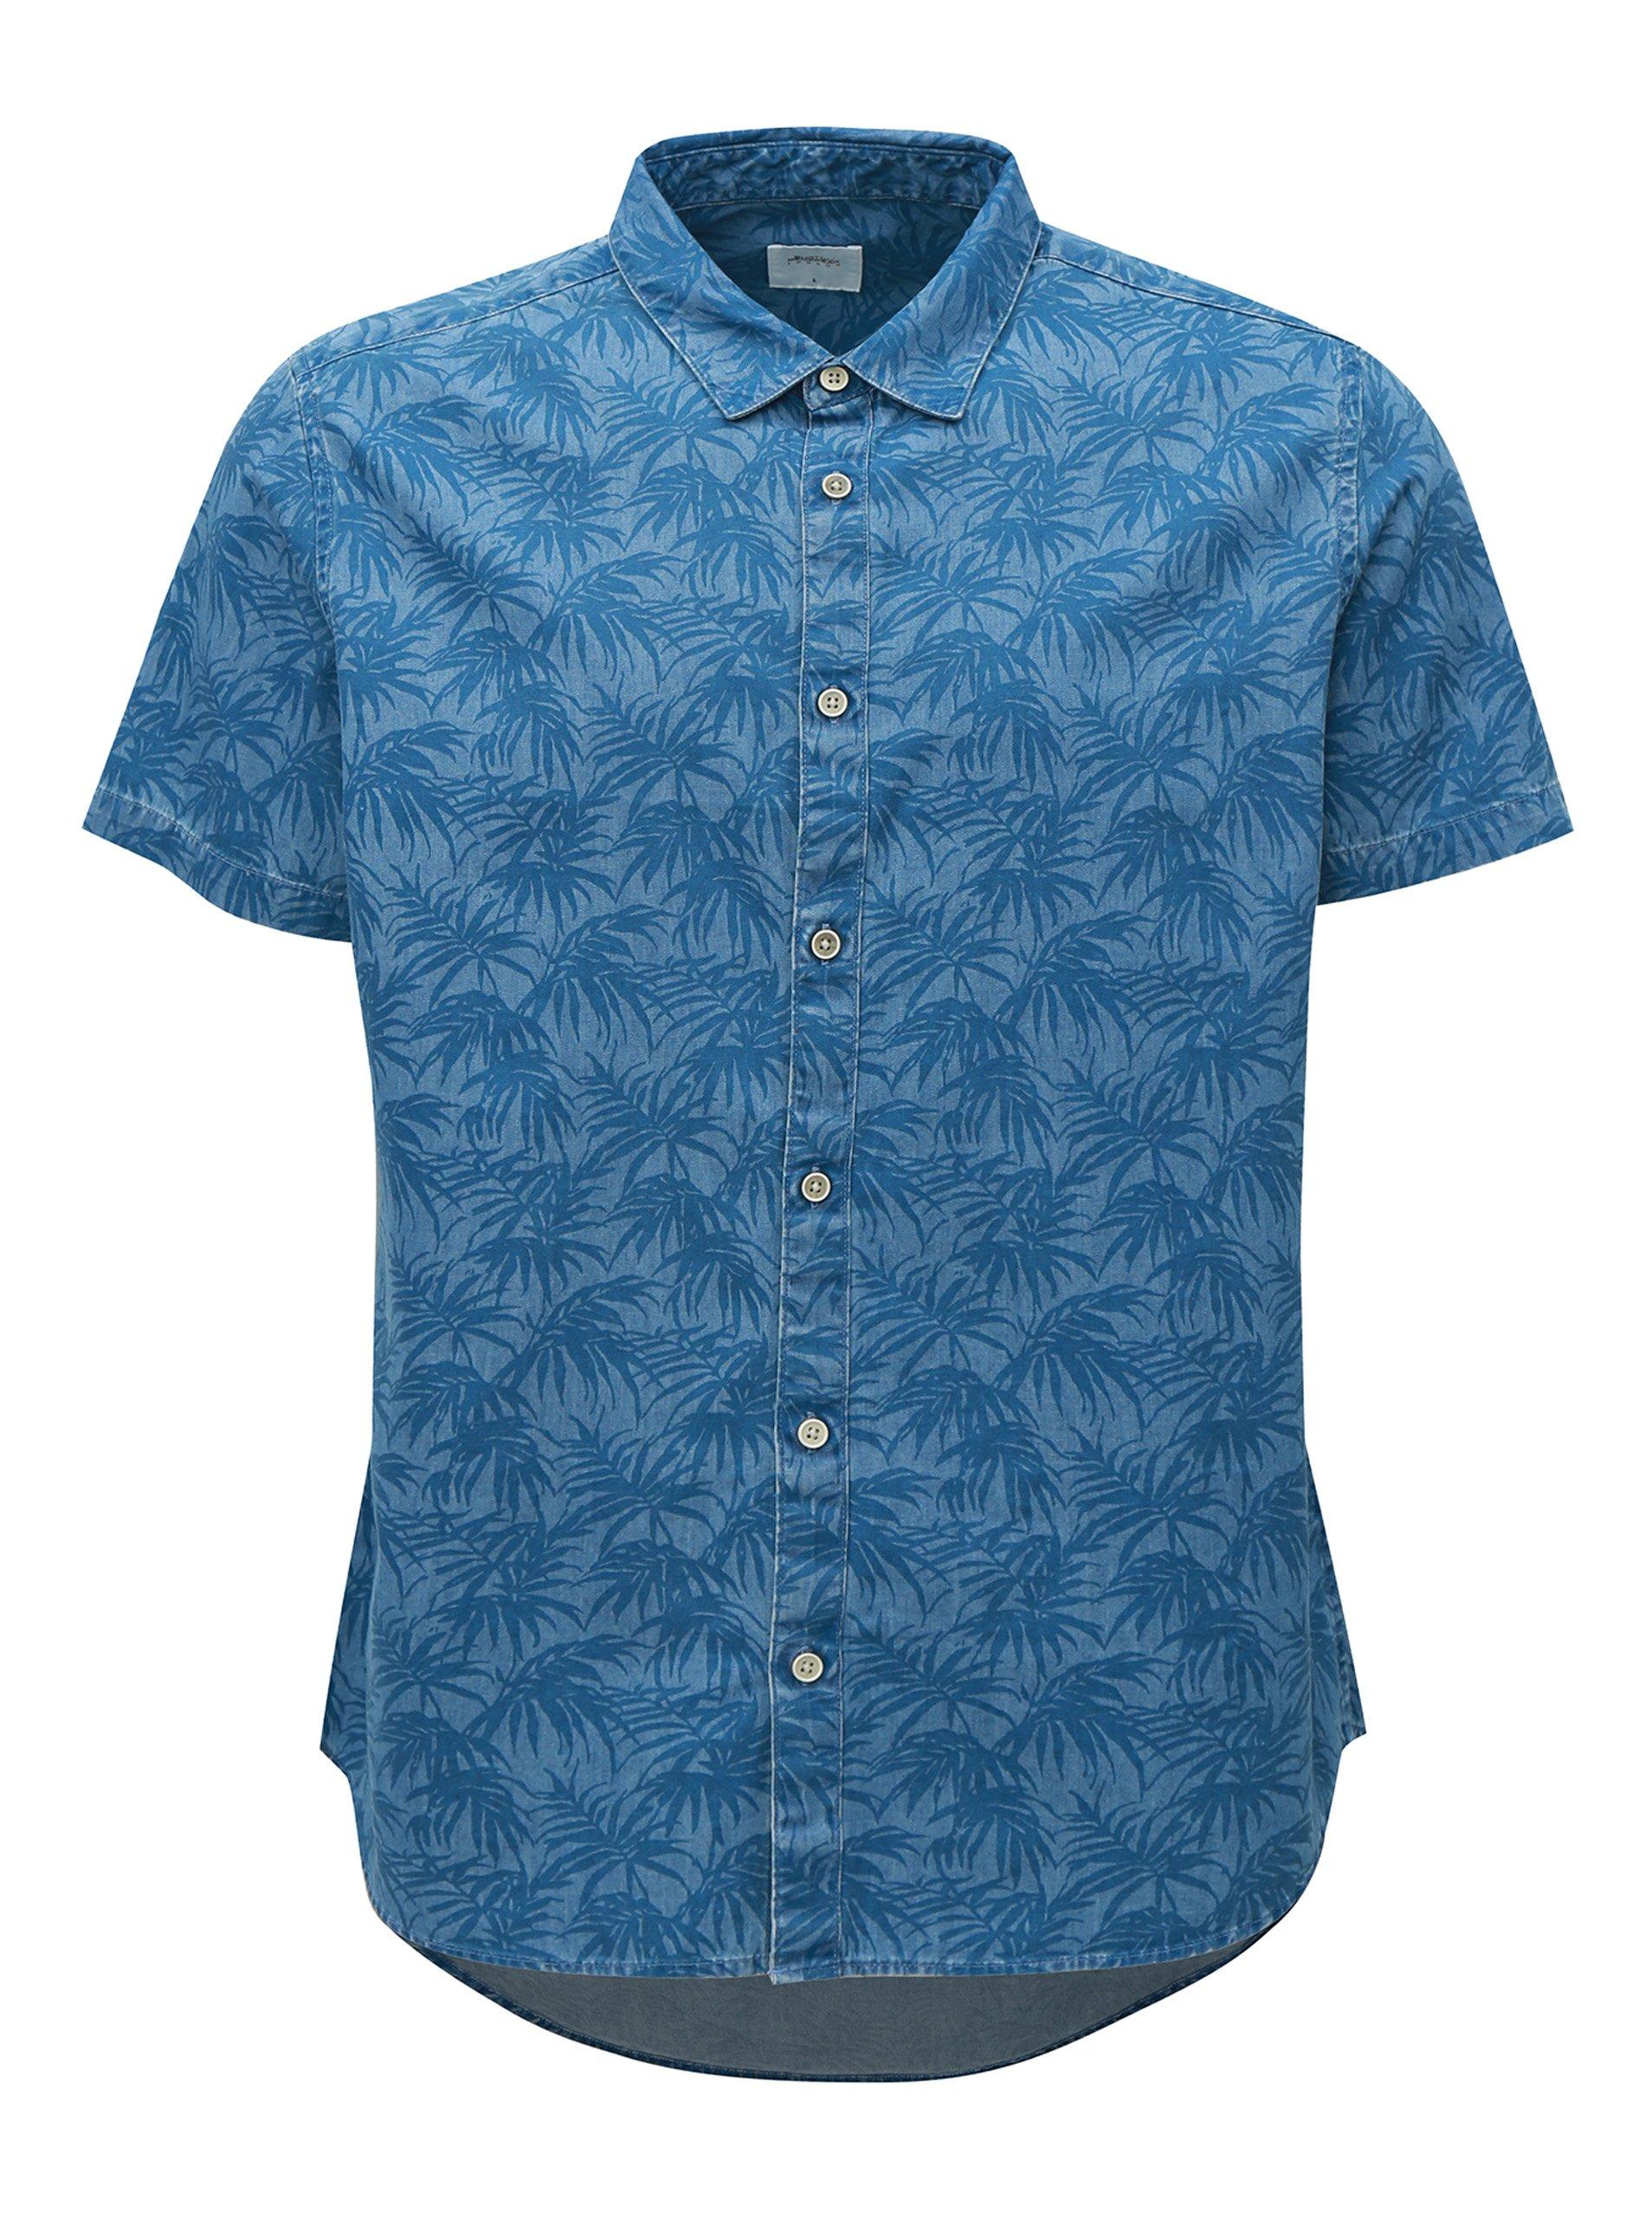 595495191c8 Modrá vzorovaná košile Burton Menswear London